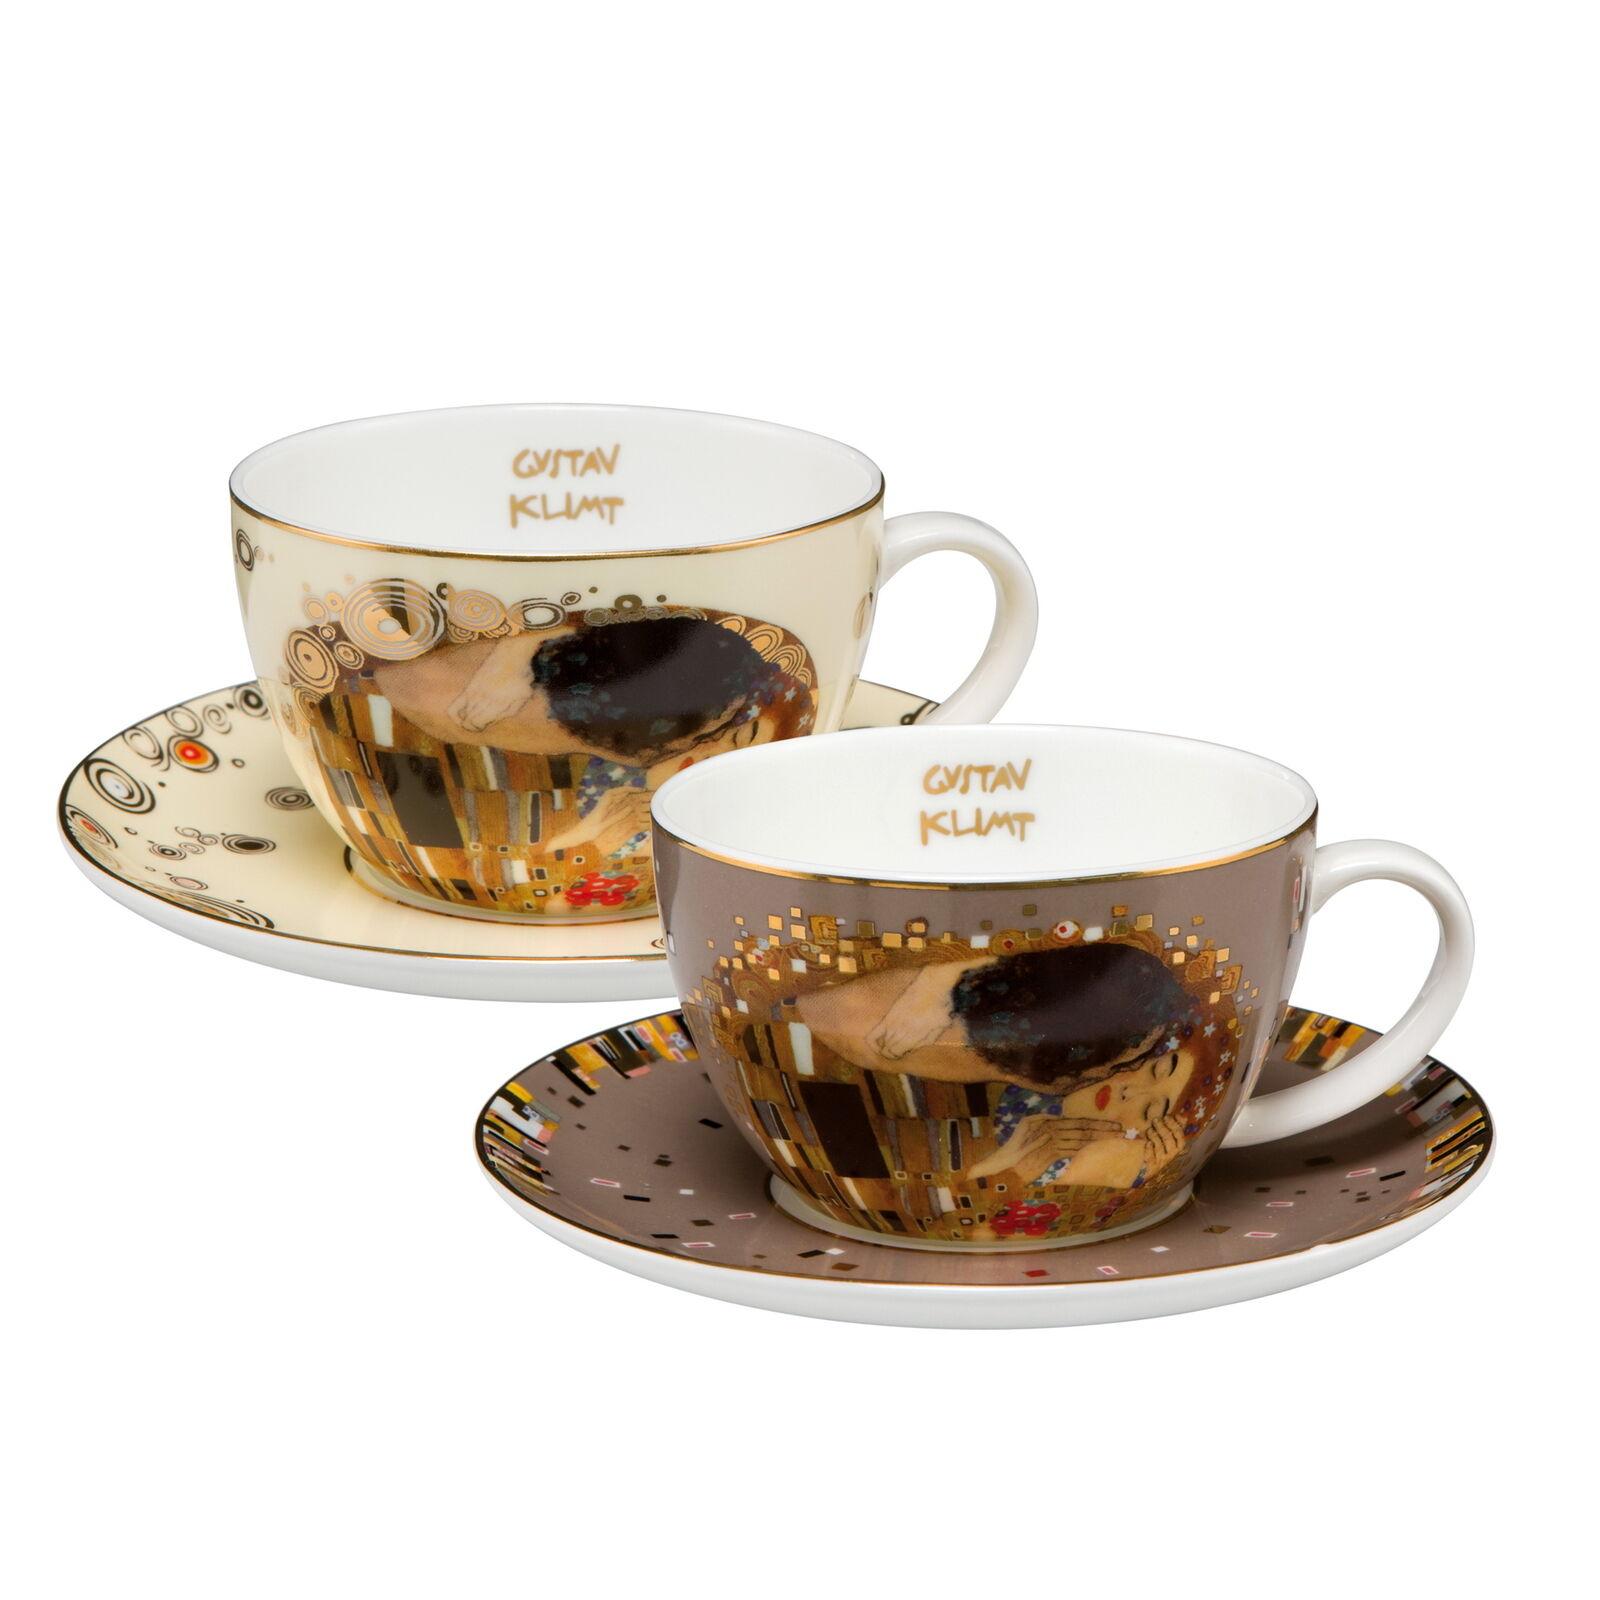 edizione limitata a caldo Goebel Porcellana Artis Orbis-Gustav Klimt  Il bacio-Set tazze tazze tazze da tè  67012511  edizione limitata